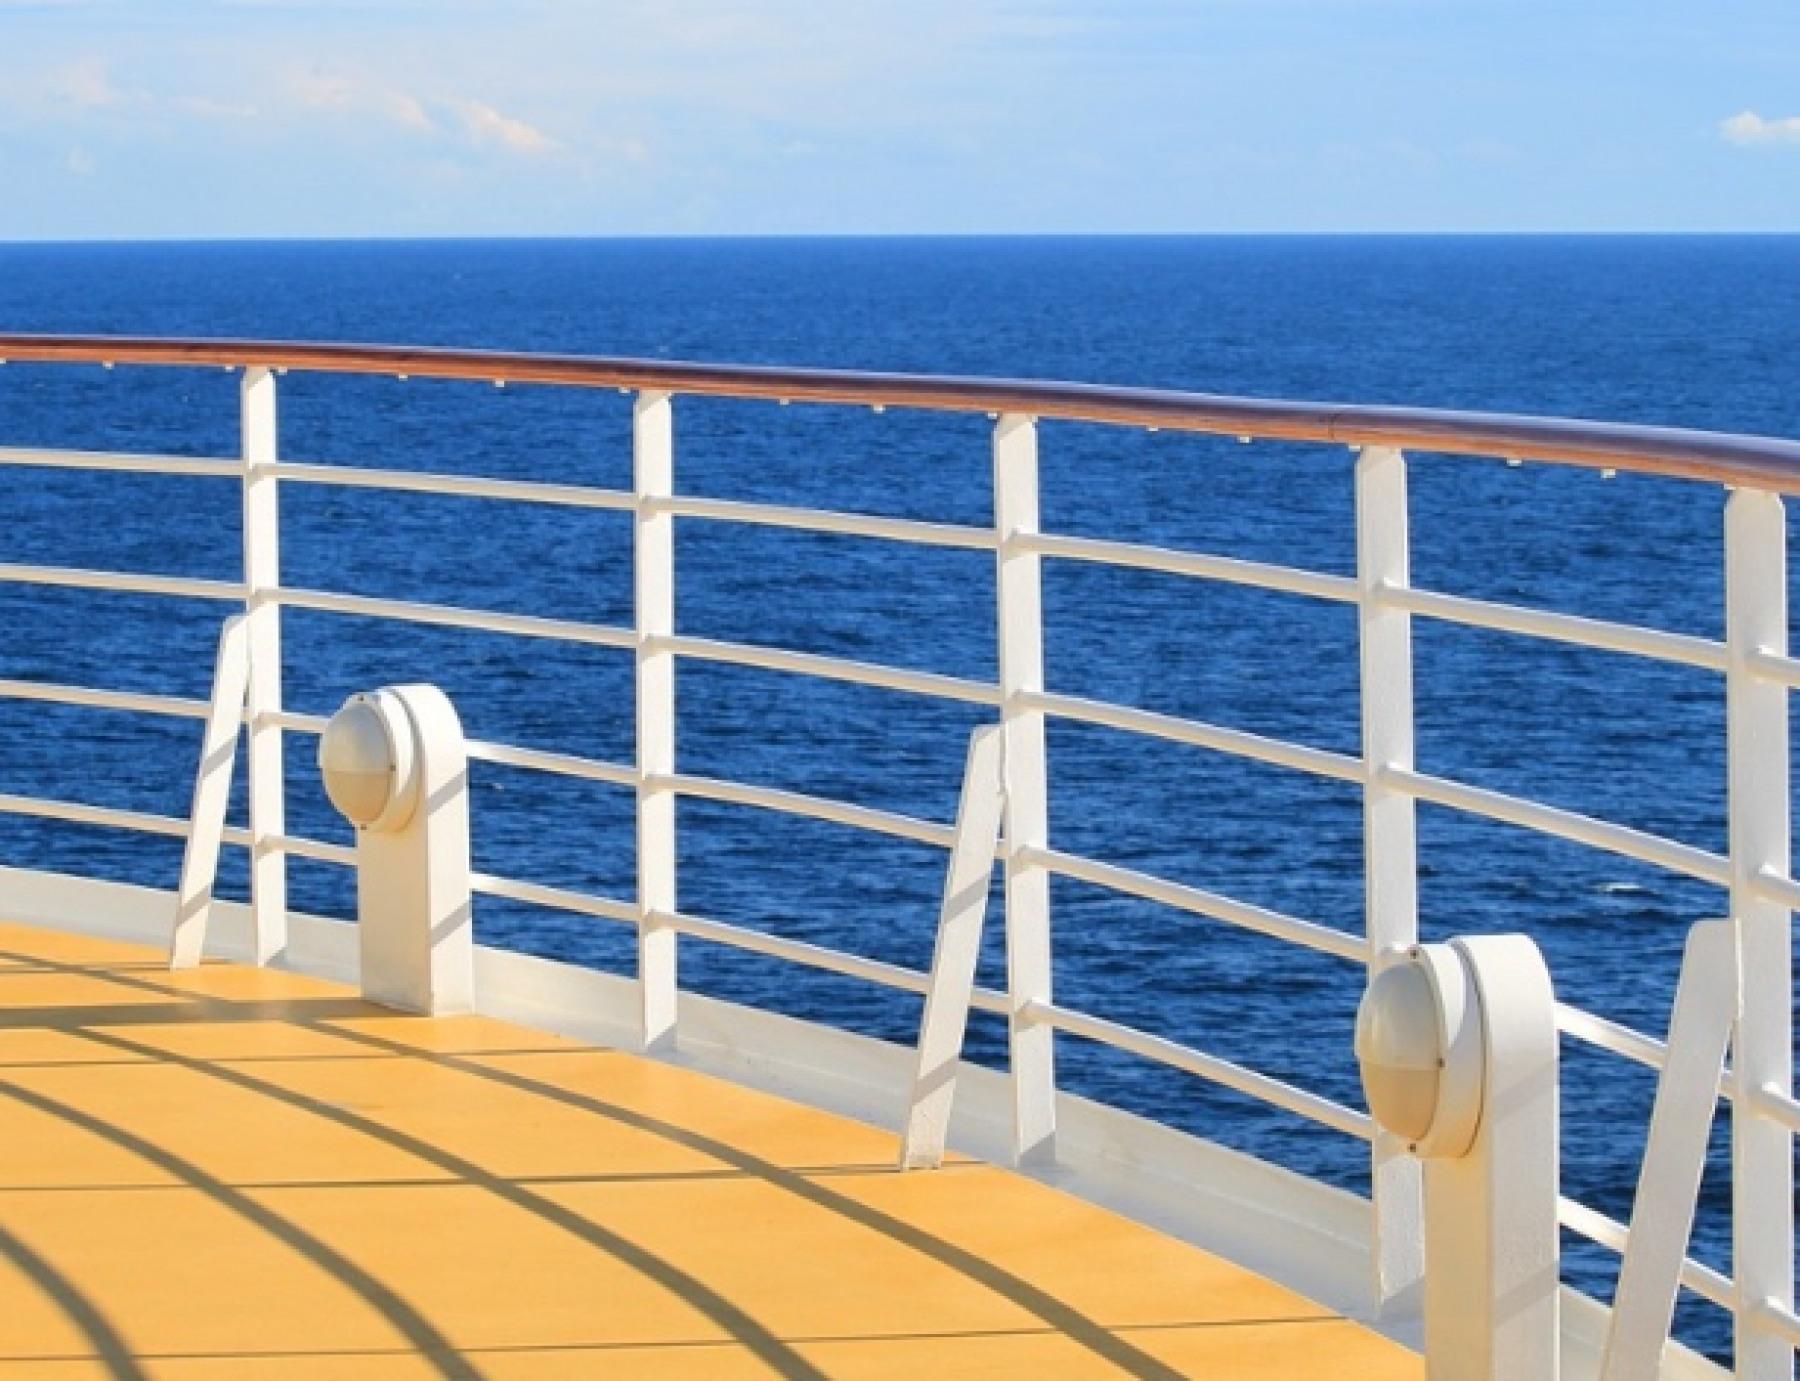 Carnival Cruise Lines Carnival Dream Interiorbeauty-salon-1.jpg